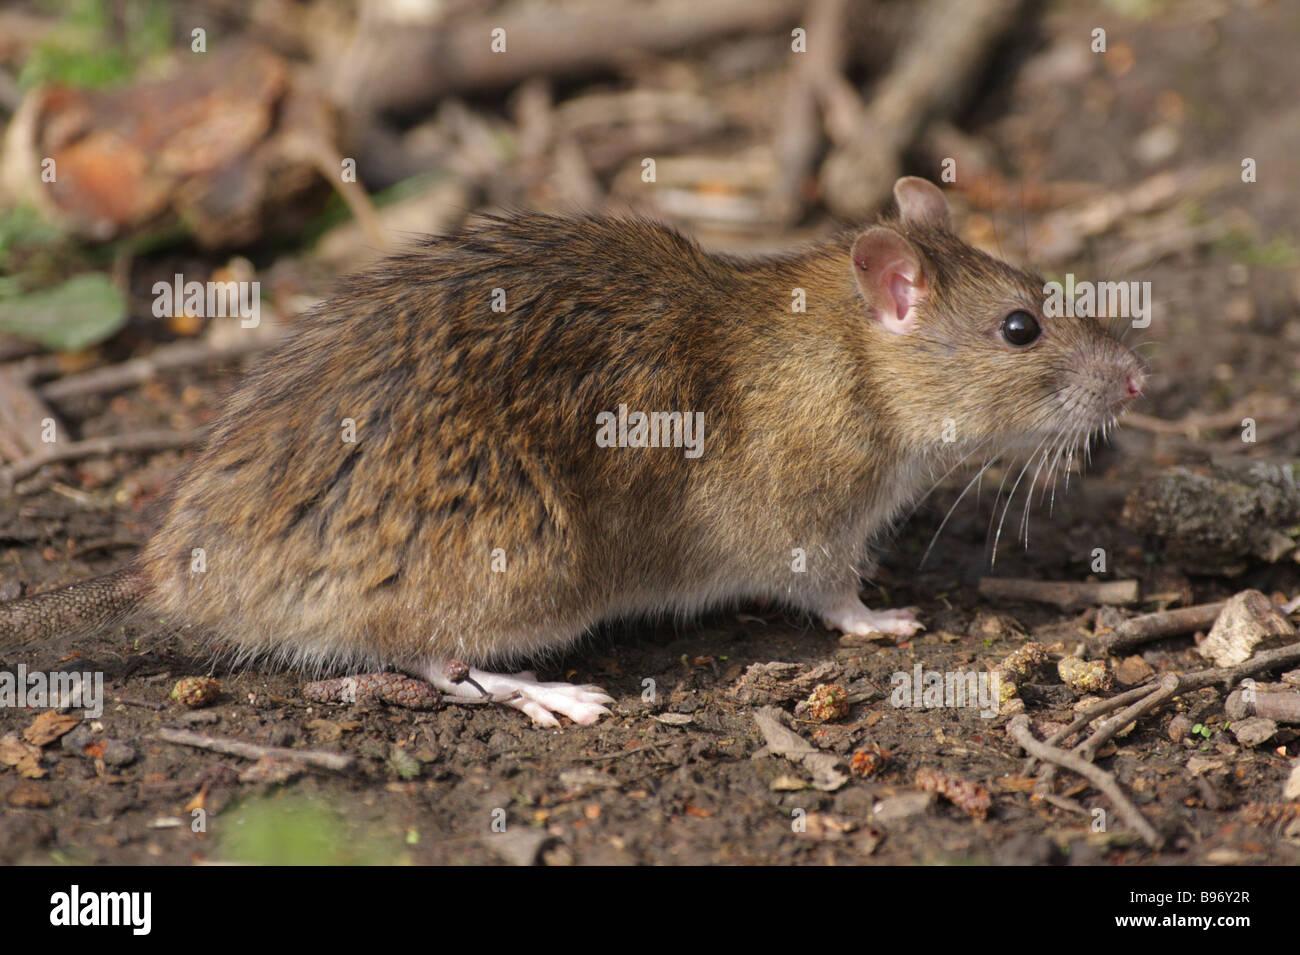 Brown Rat - Rattus norvegicus - Stock Image